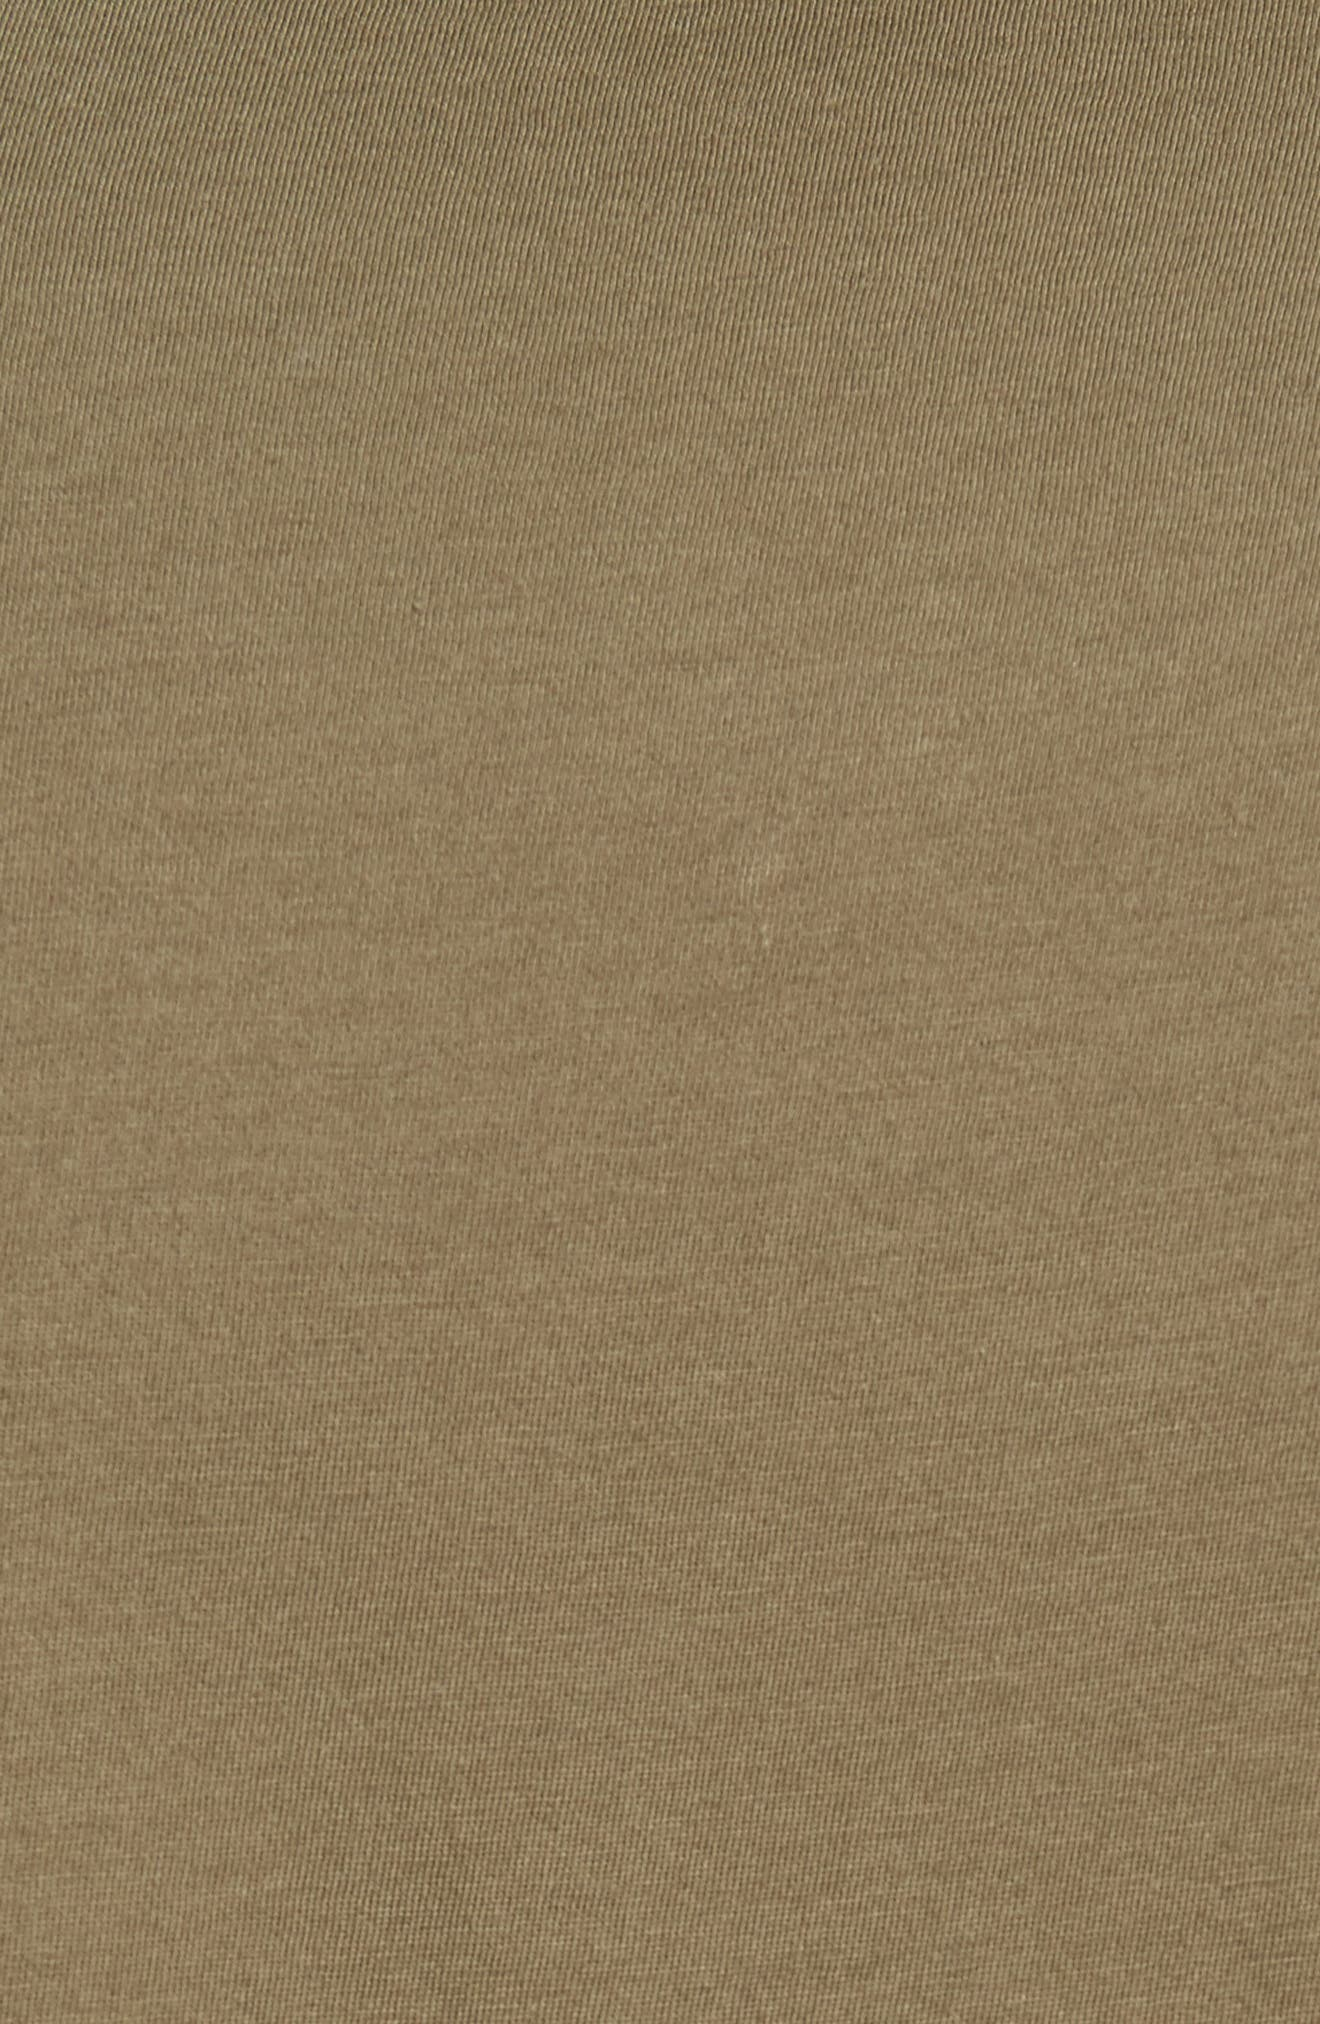 Slim Fit T-Shirt,                             Alternate thumbnail 5, color,                             300